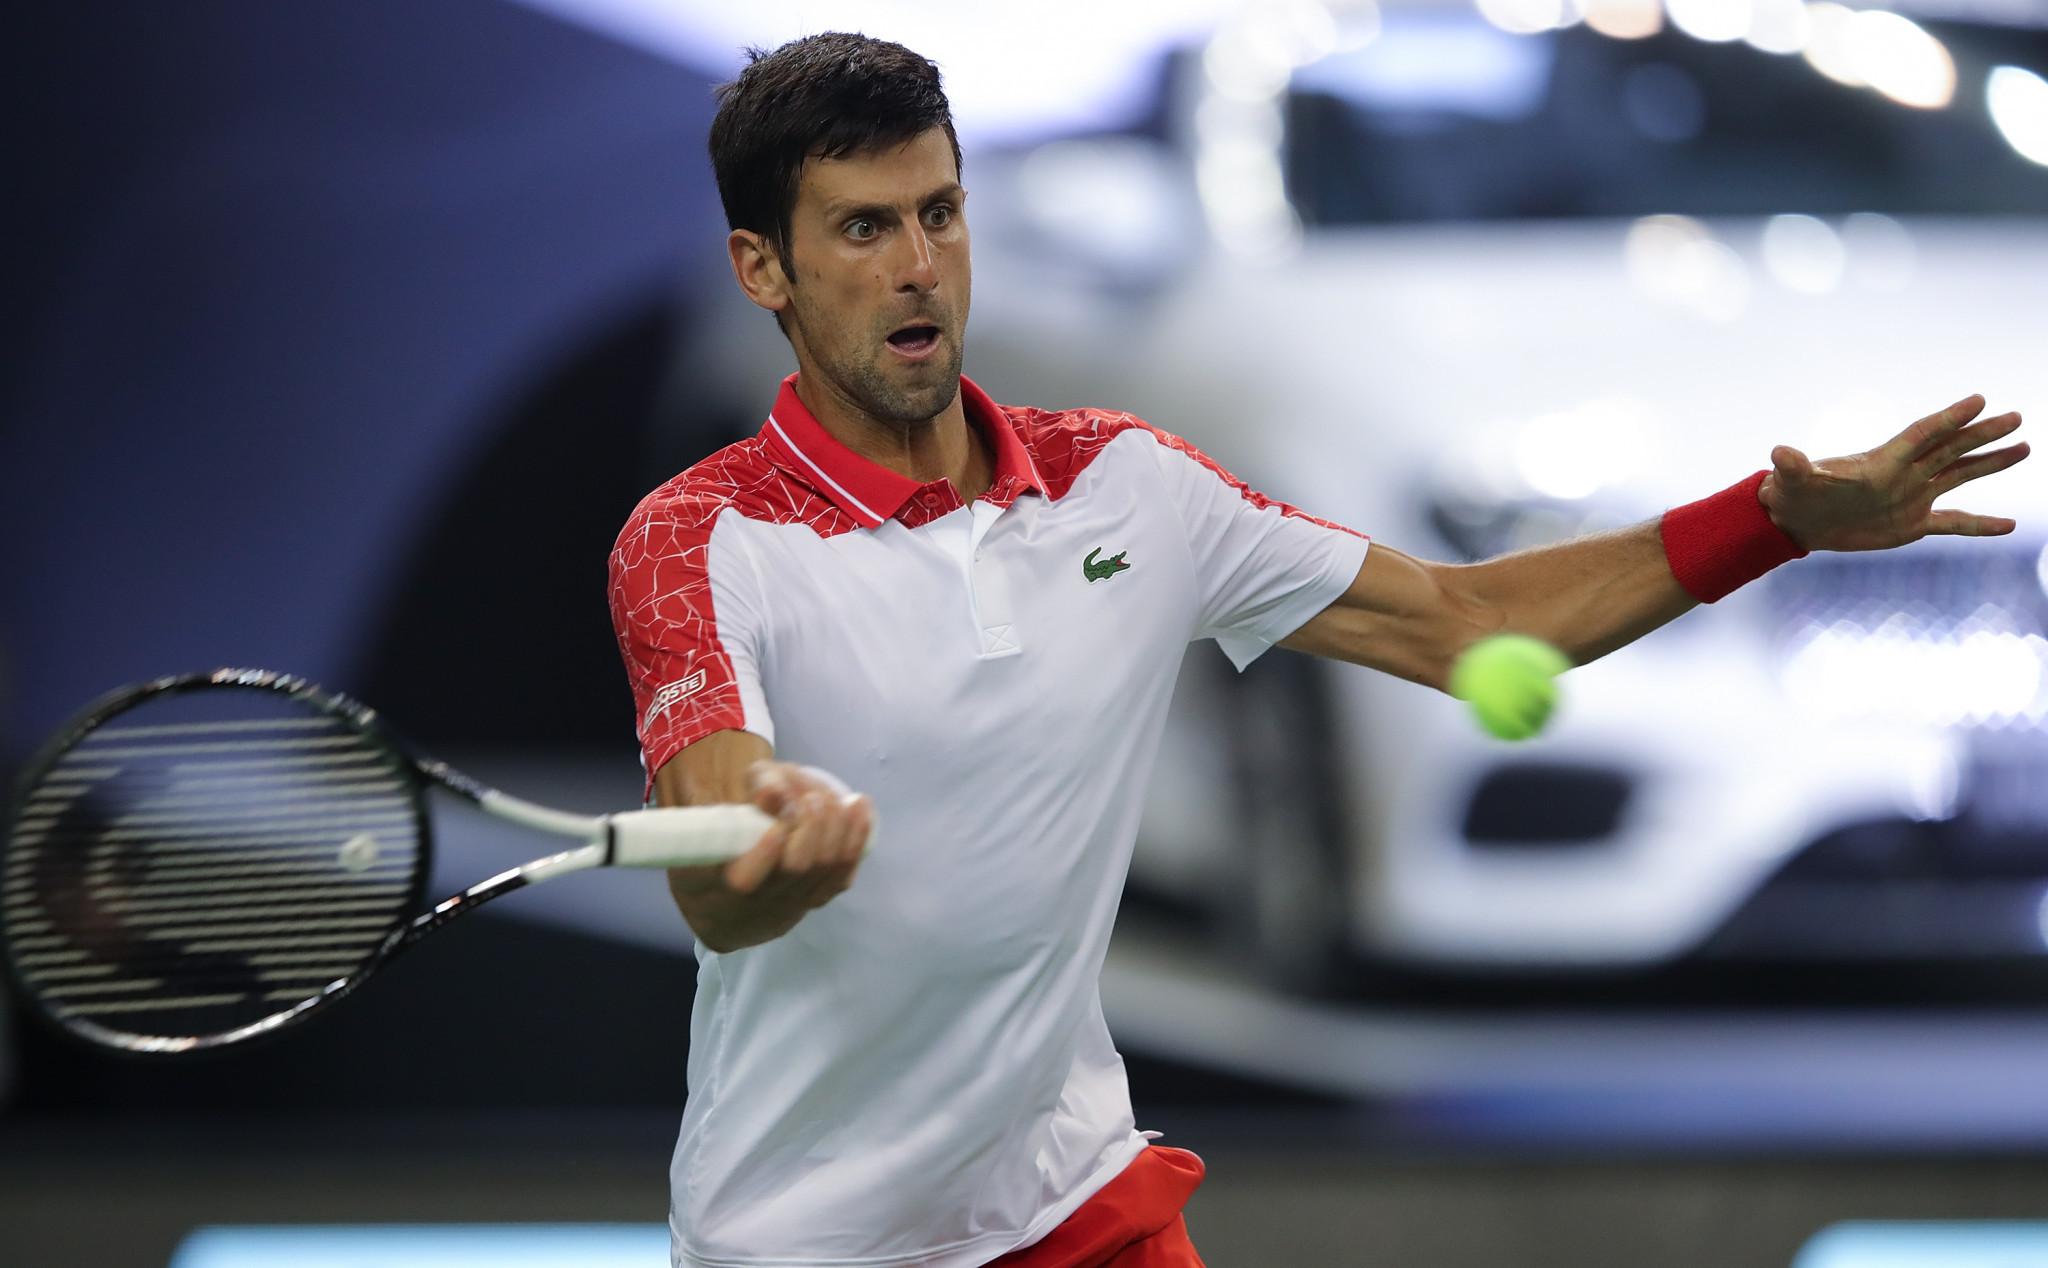 Djokovic progresses to last 16 of Shanghai Masters